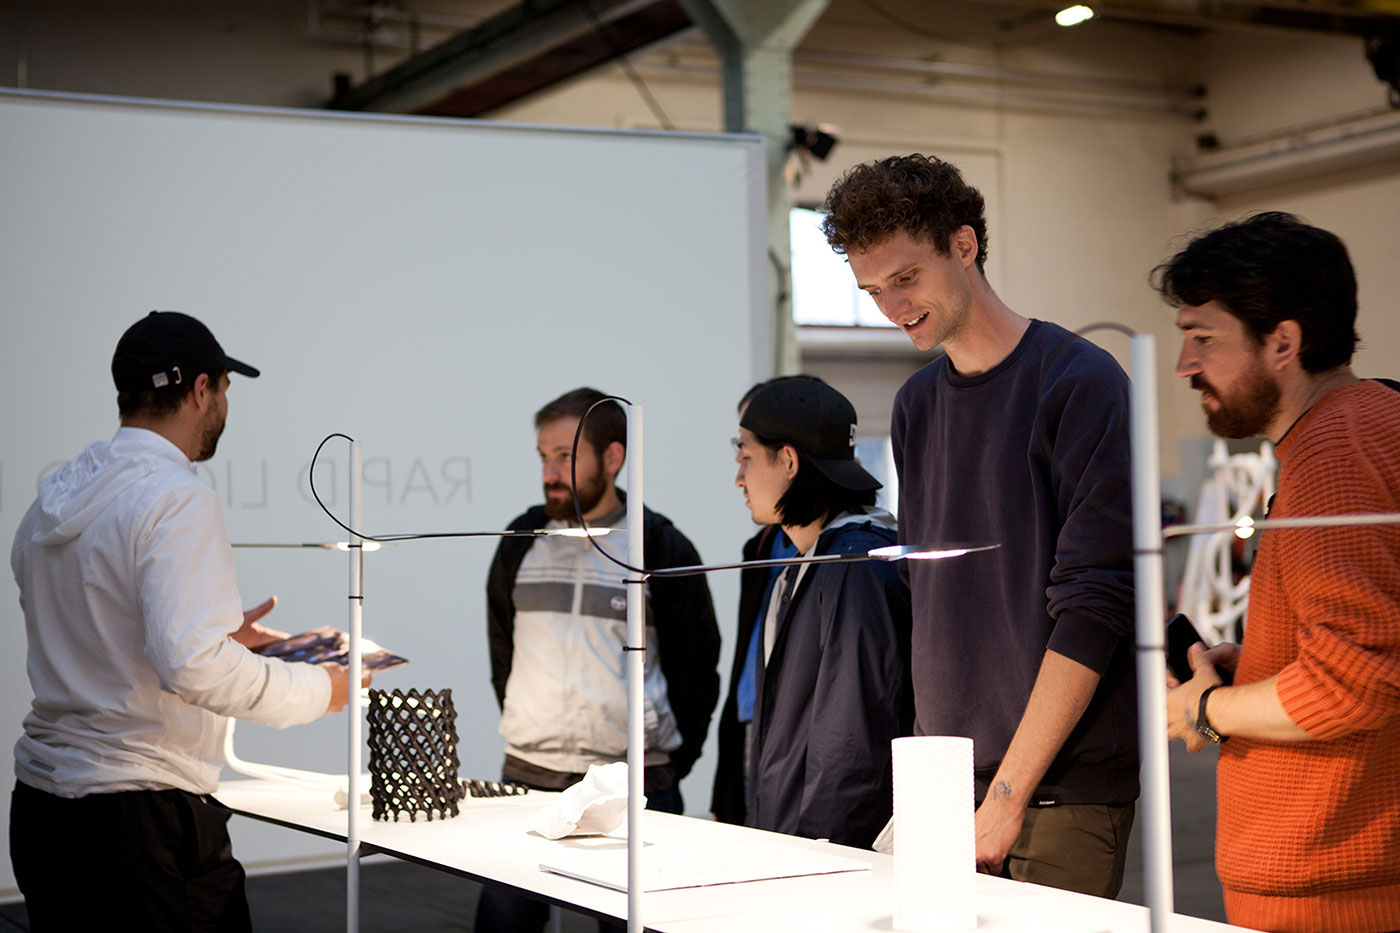 Design Biennale Zürich 2017, Active Materials, Christophe Guberan (Foto: Lukas Beyeler)